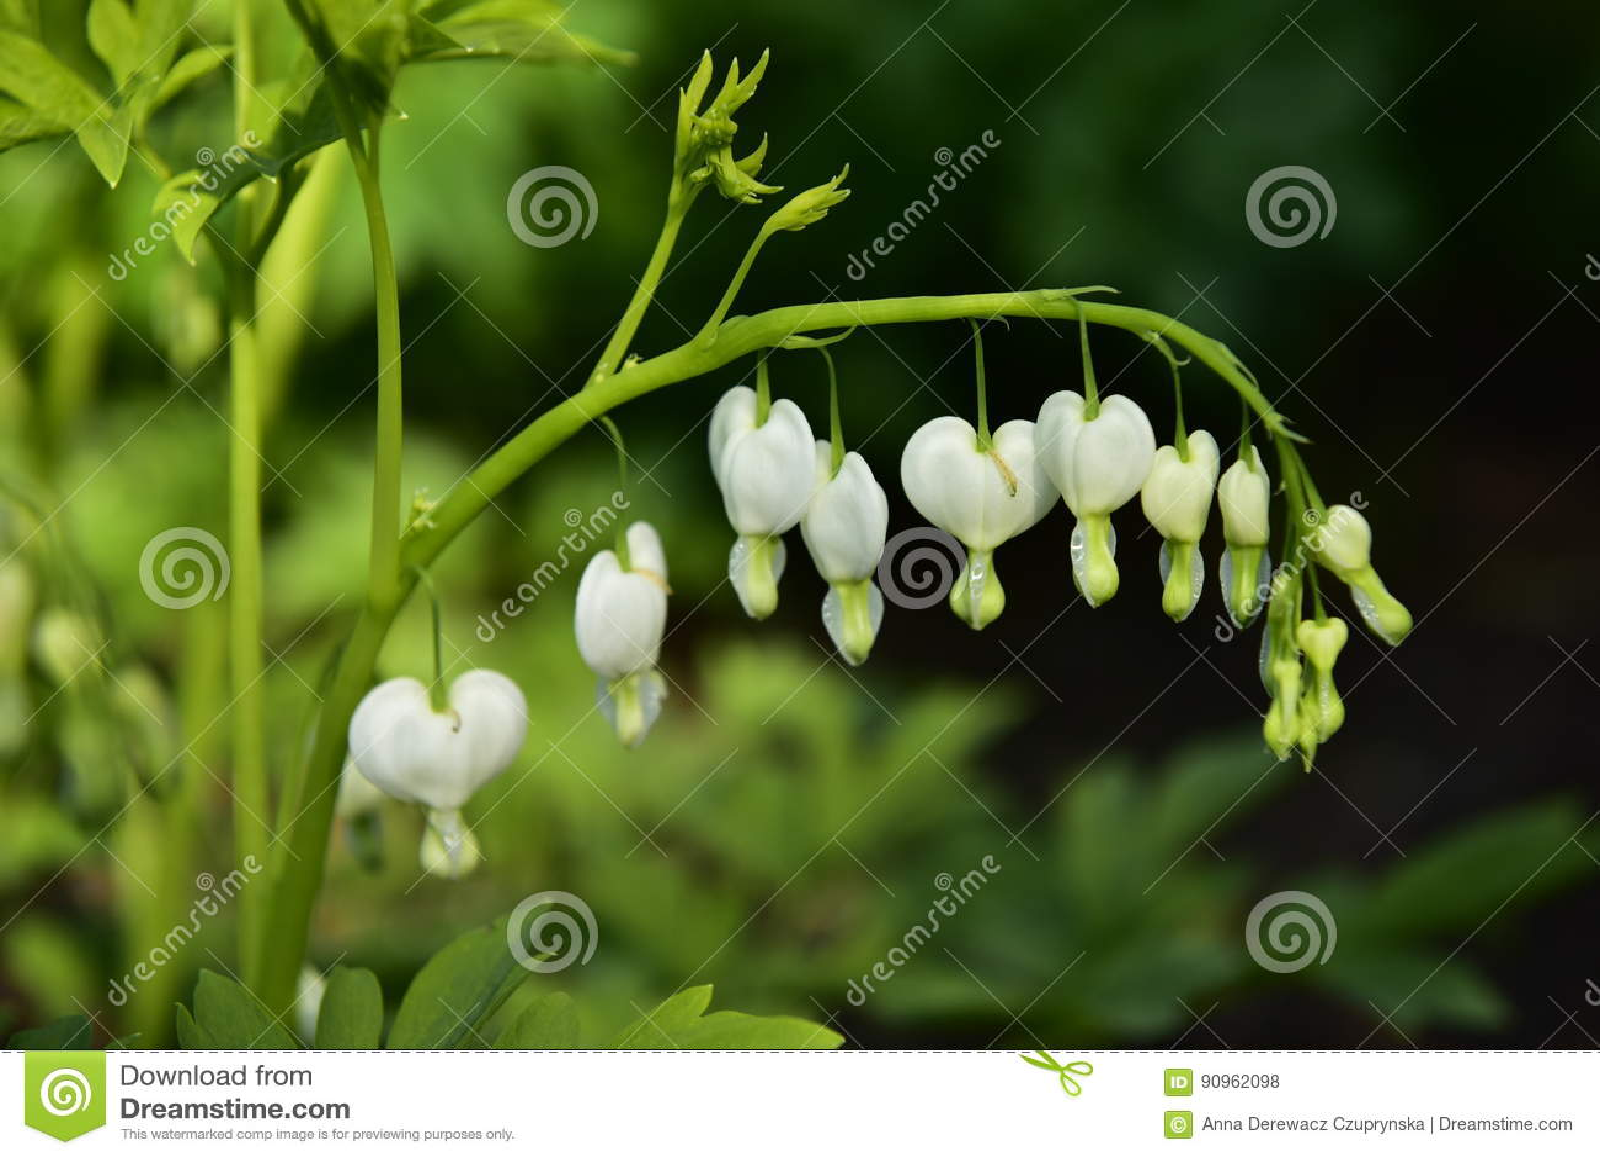 Biali serce kwiaty